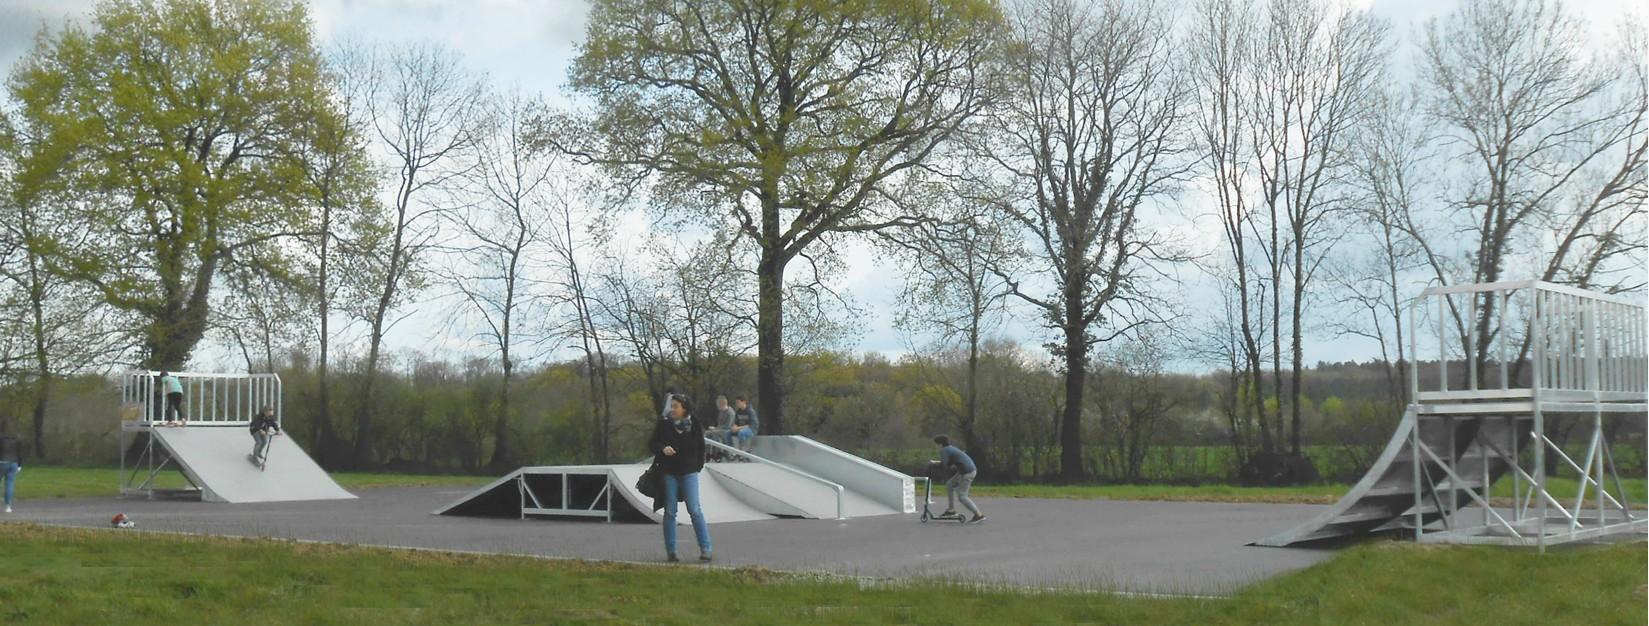 Skatepark configuration 1